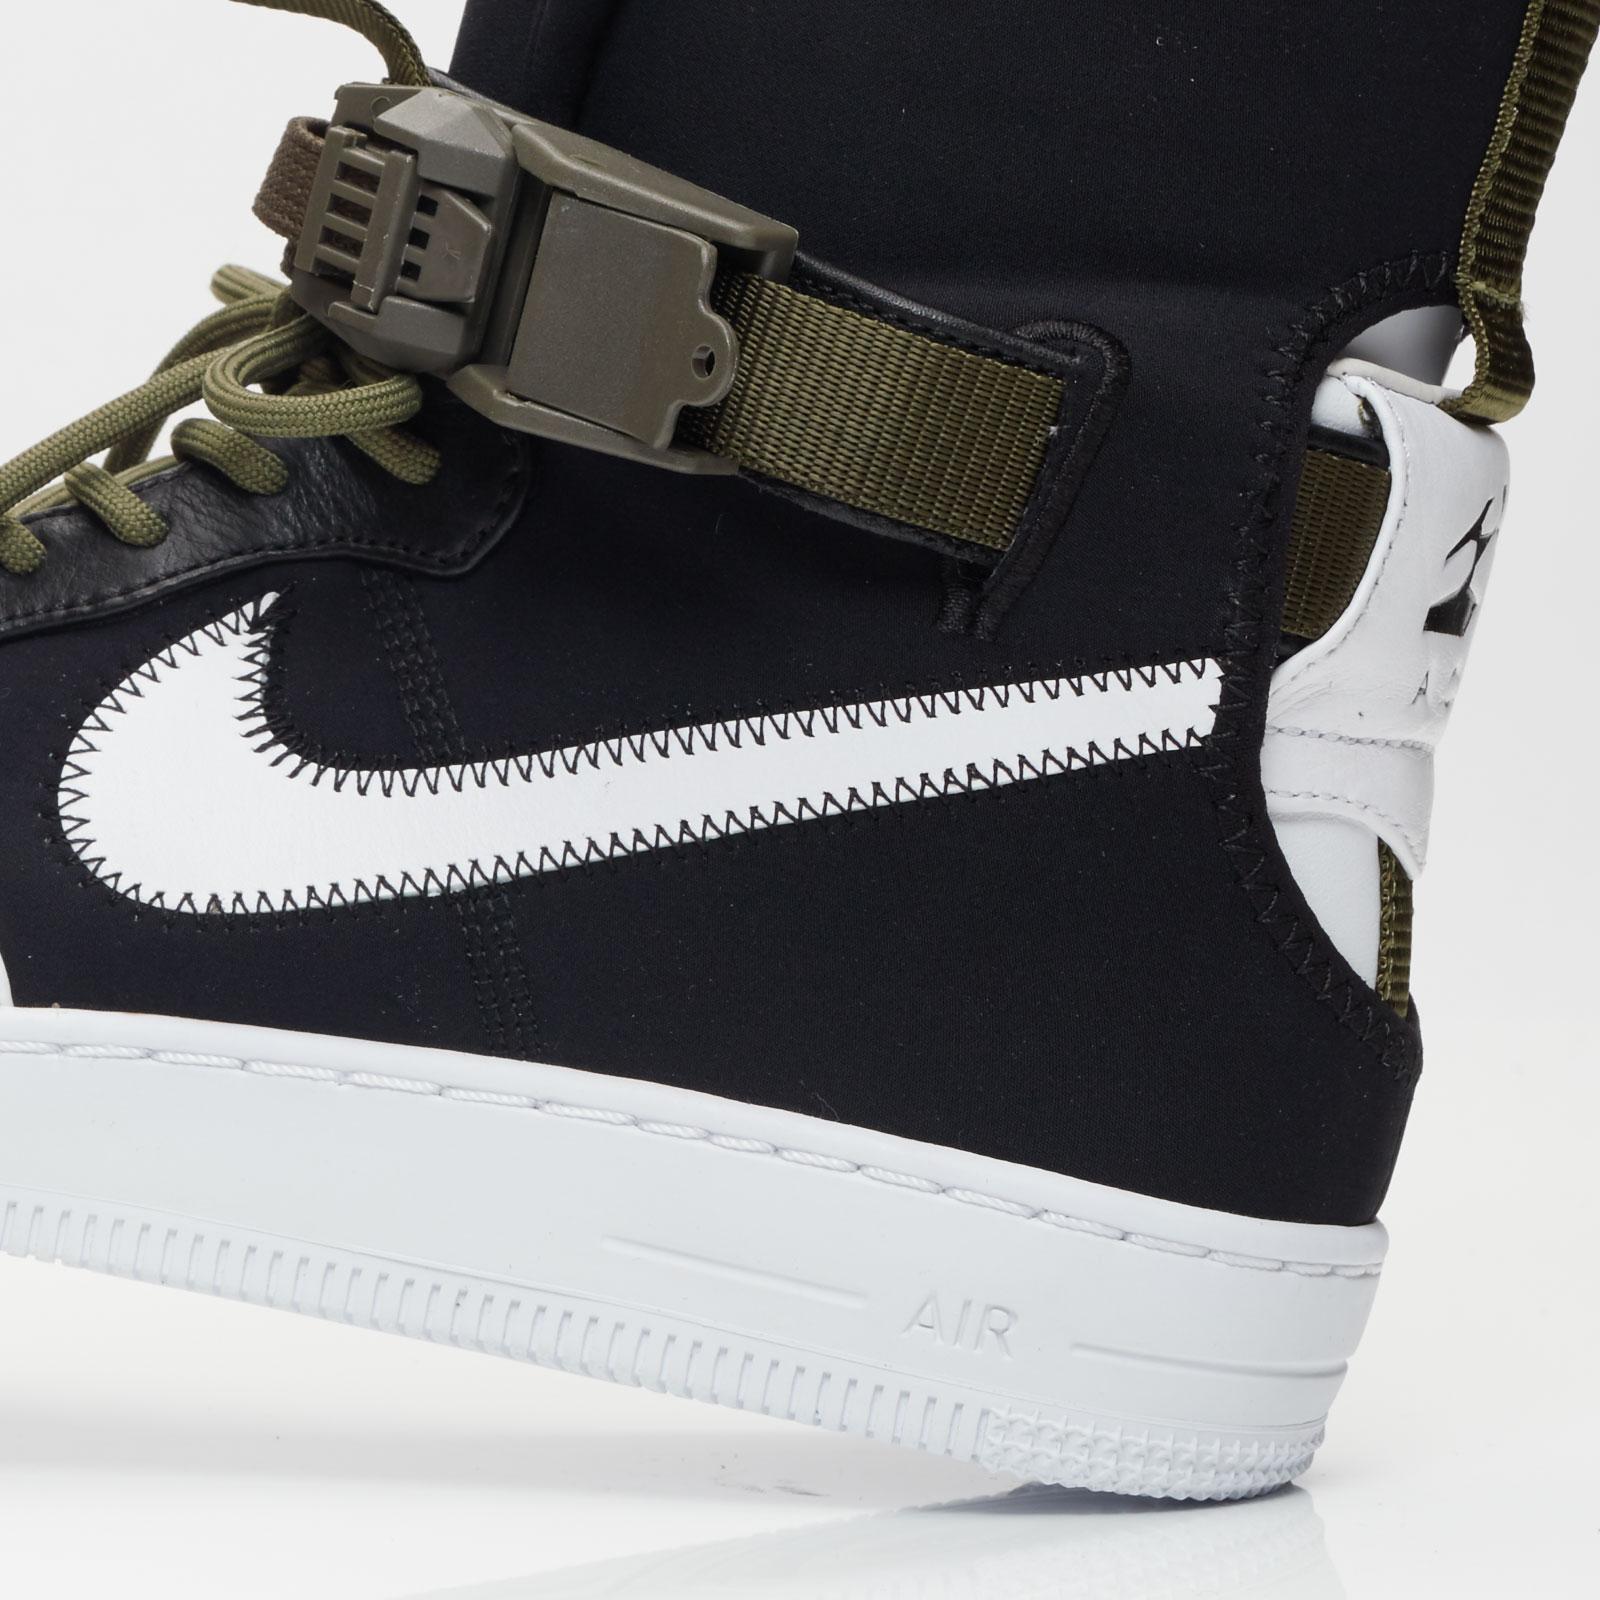 a2ae64e65e Nike Af1 Downtown Hi Sp / Acronym - 649941-001 - Sneakersnstuff   sneakers  & streetwear online since 1999